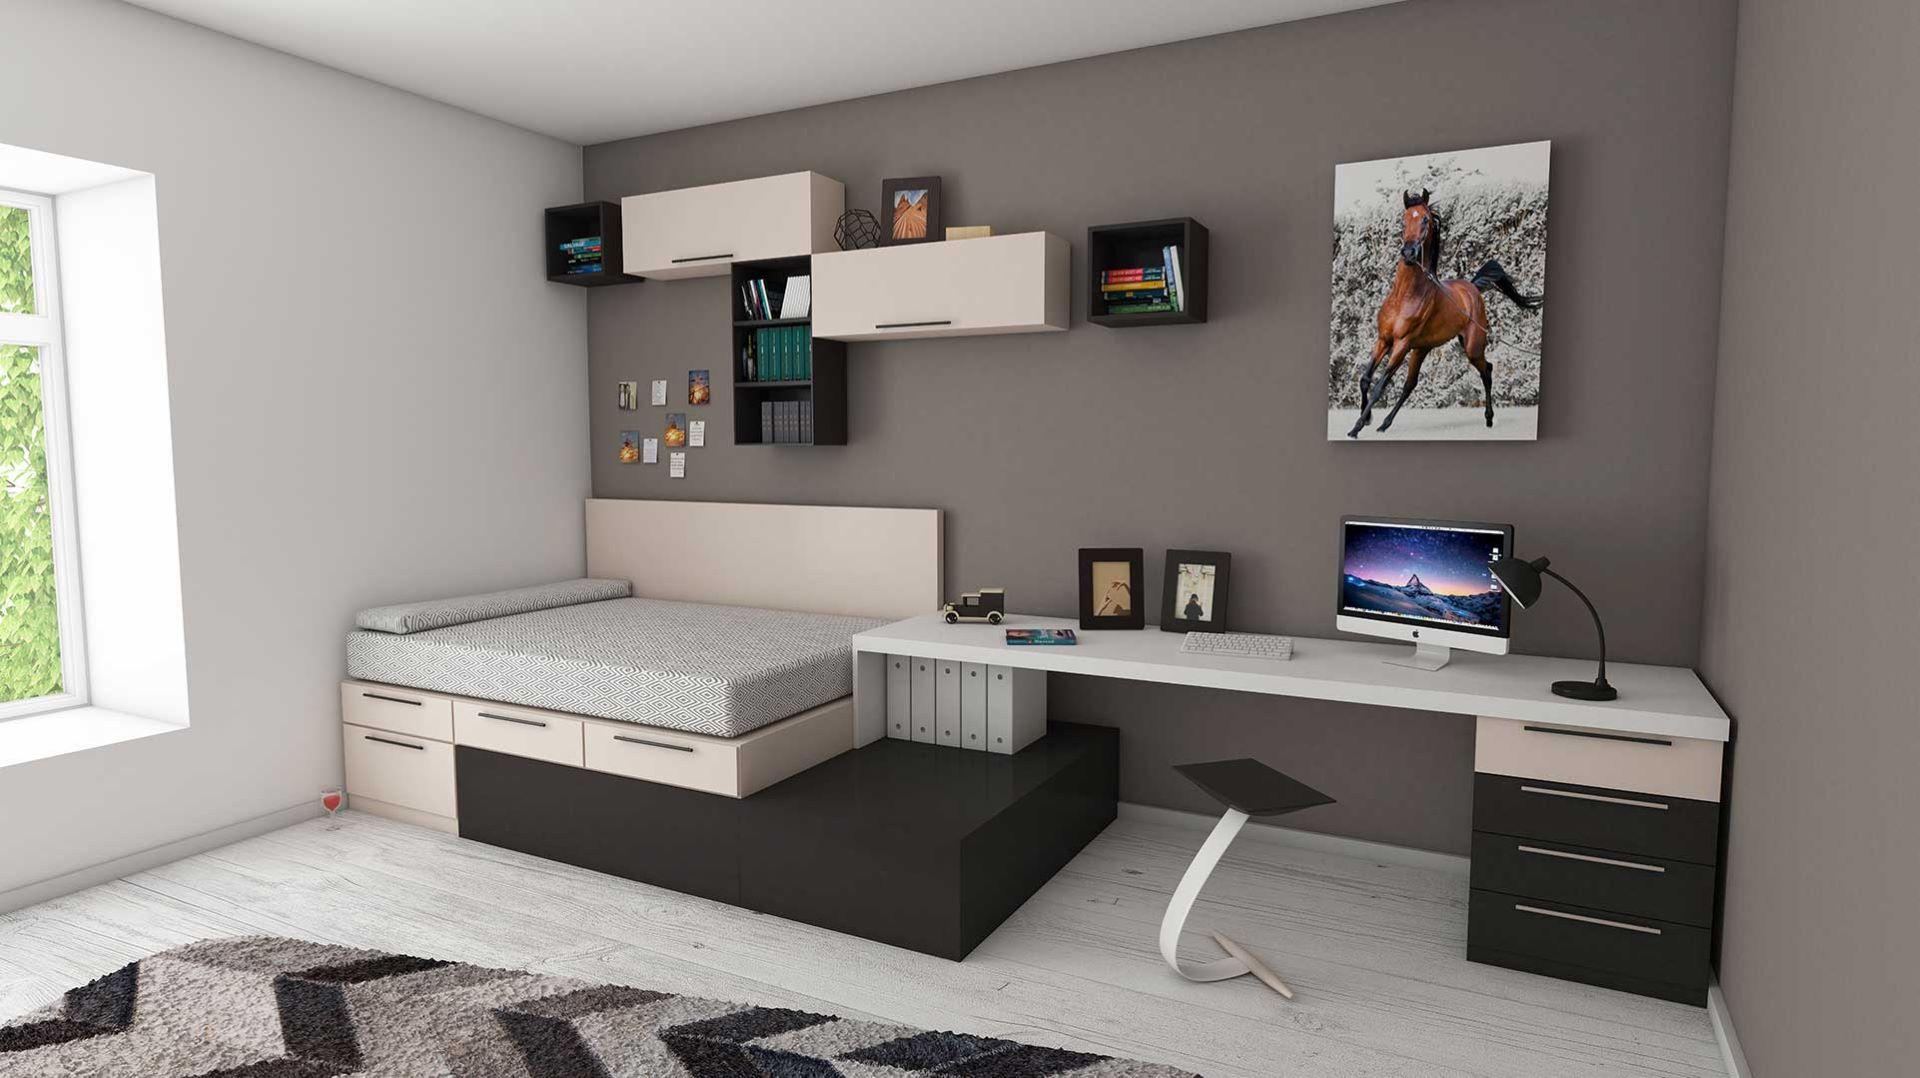 Multipurpose furniture in a Contemporary bedroom